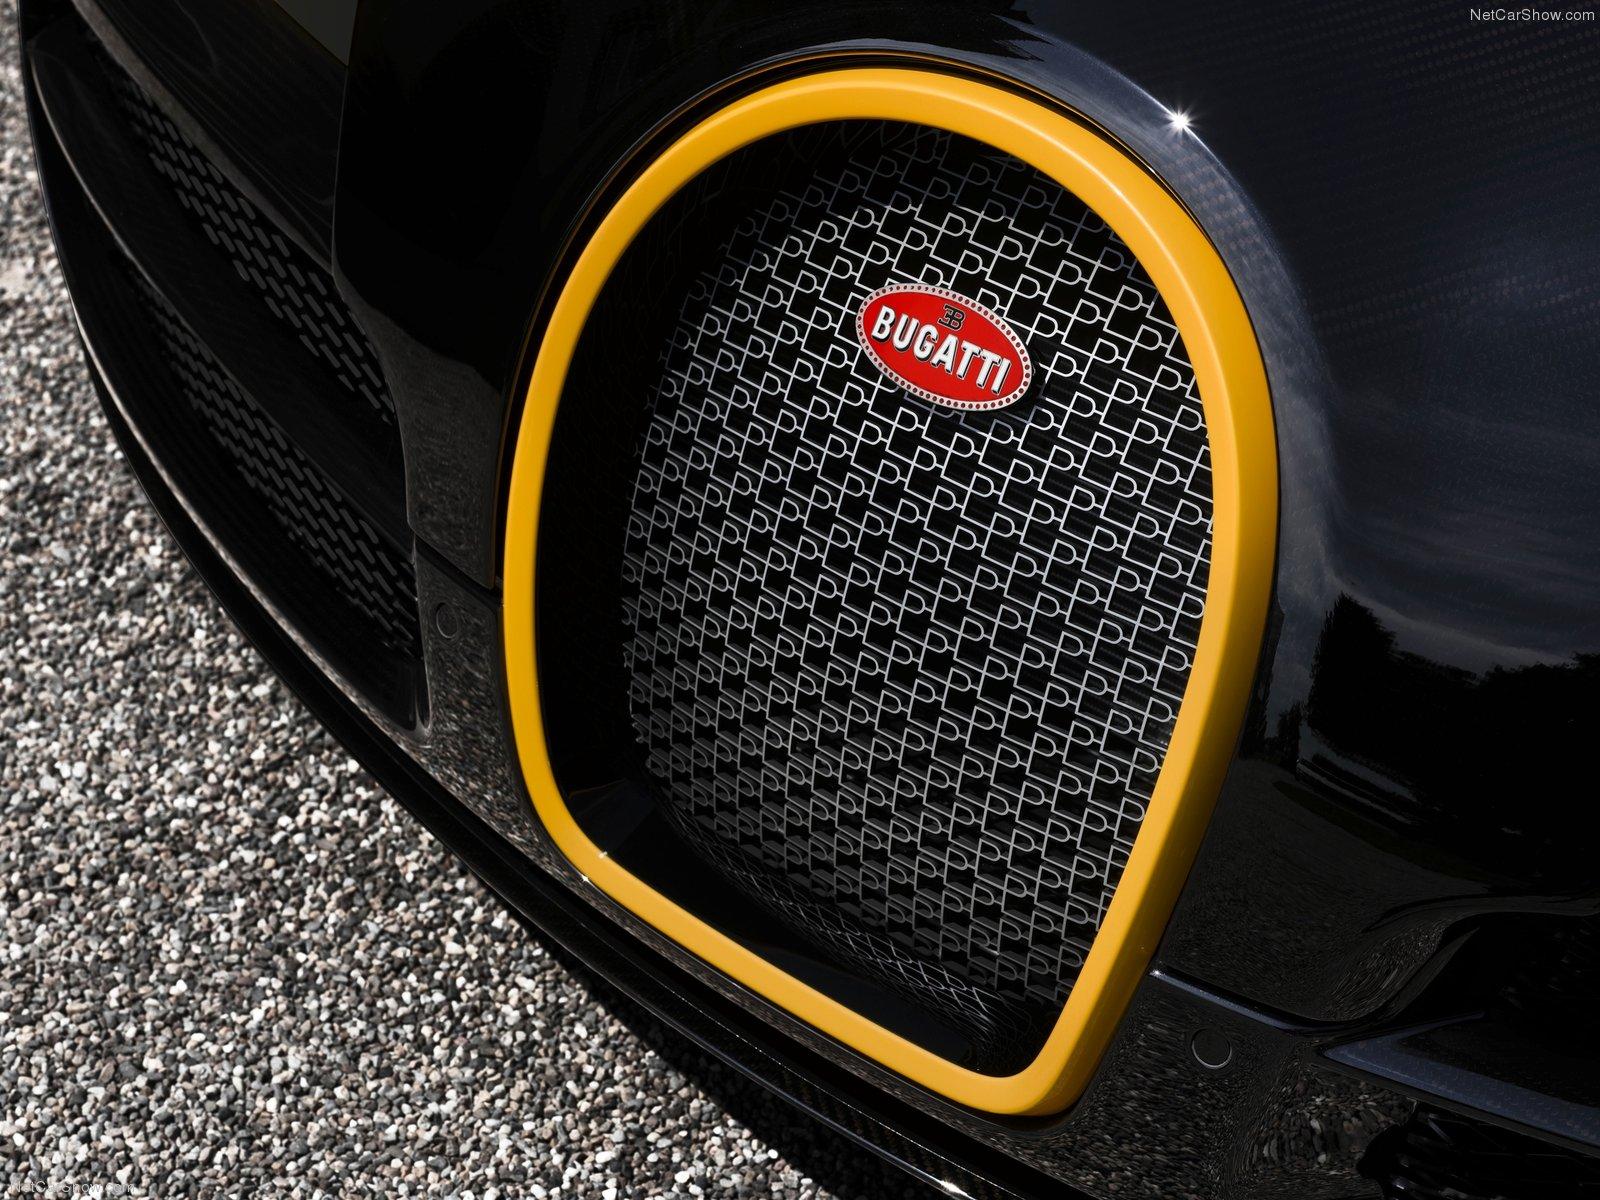 2014%2BBugatti%2BVeyron%2BGrand%2BSport%2BVitesse%2B1of1%2B%25288%2529 Astounding Xe Bugatti Veyron Grand Sport Vitesse Cars Trend